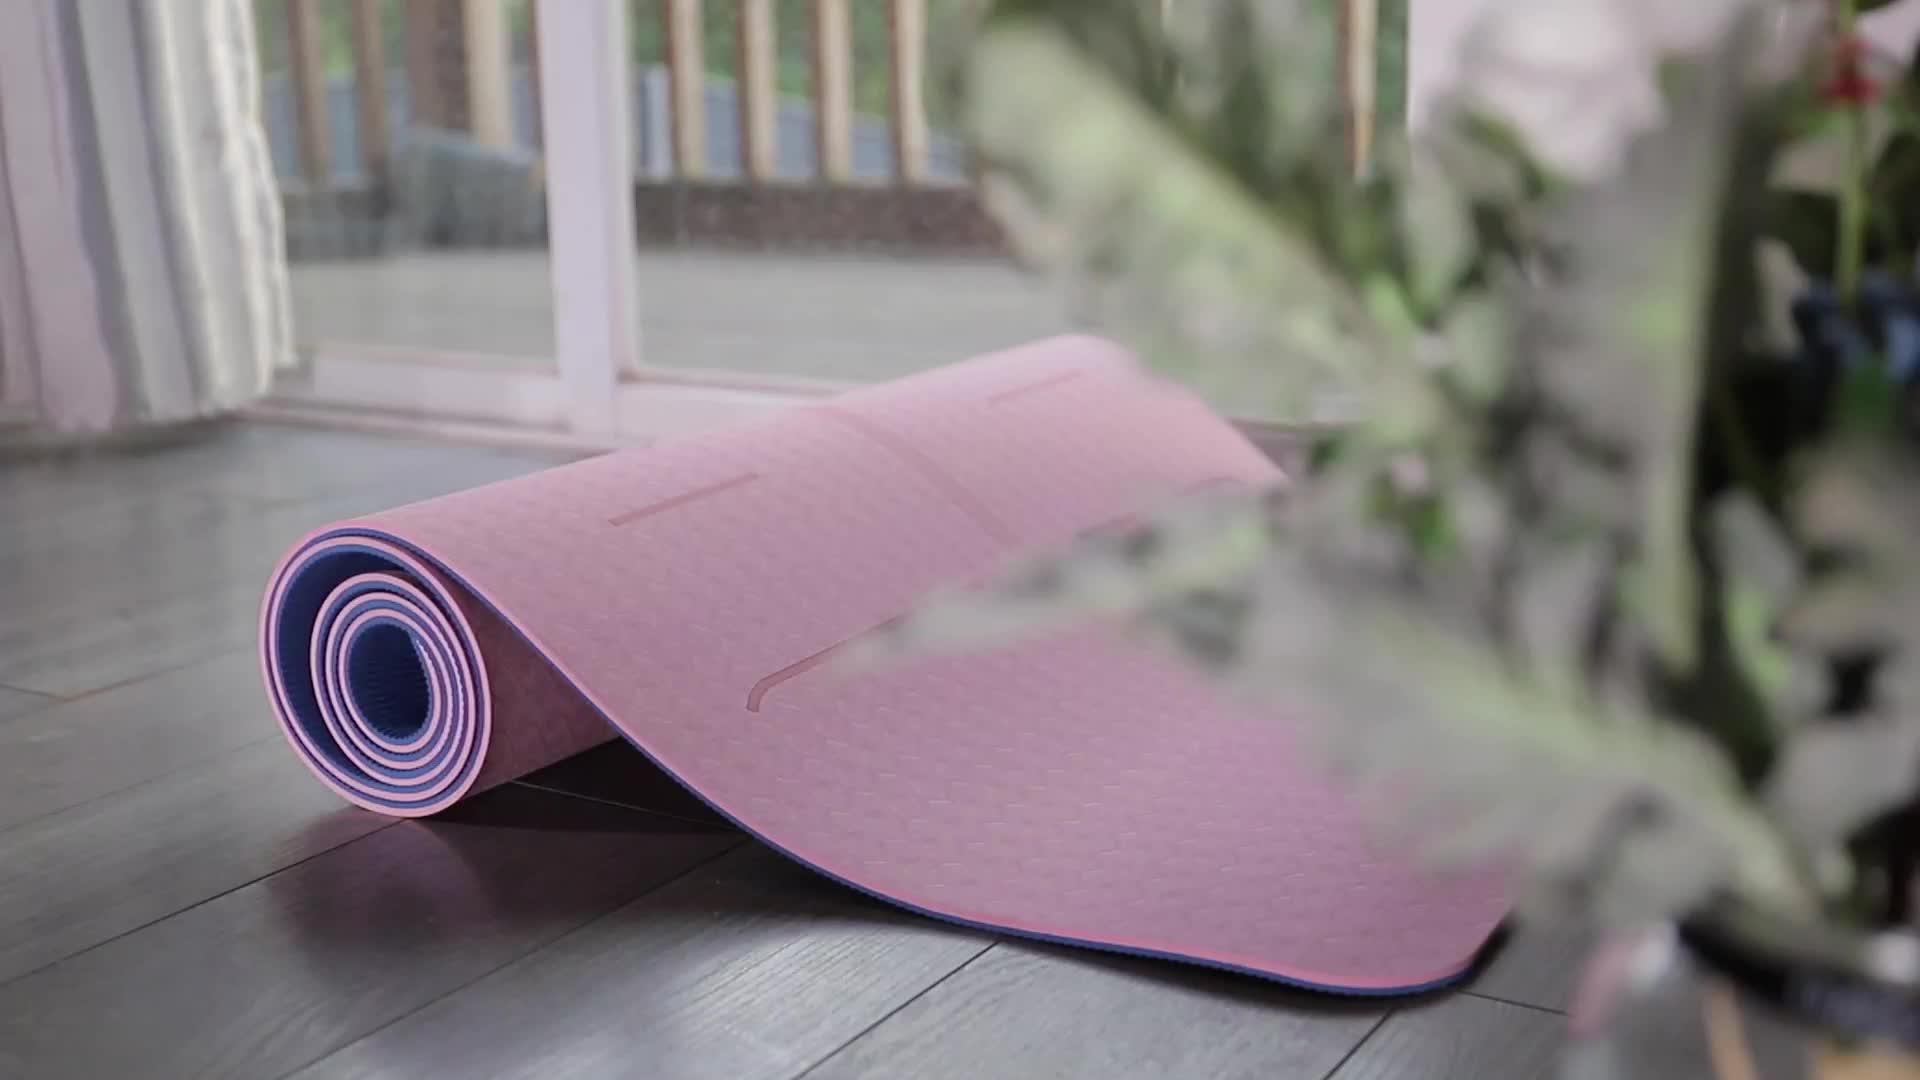 2017 विरोधी पर्ची गर्म योग चटाई, योग चटाई कस्टम पर्यावरण के अनुकूल, थोक व्यायाम मैट